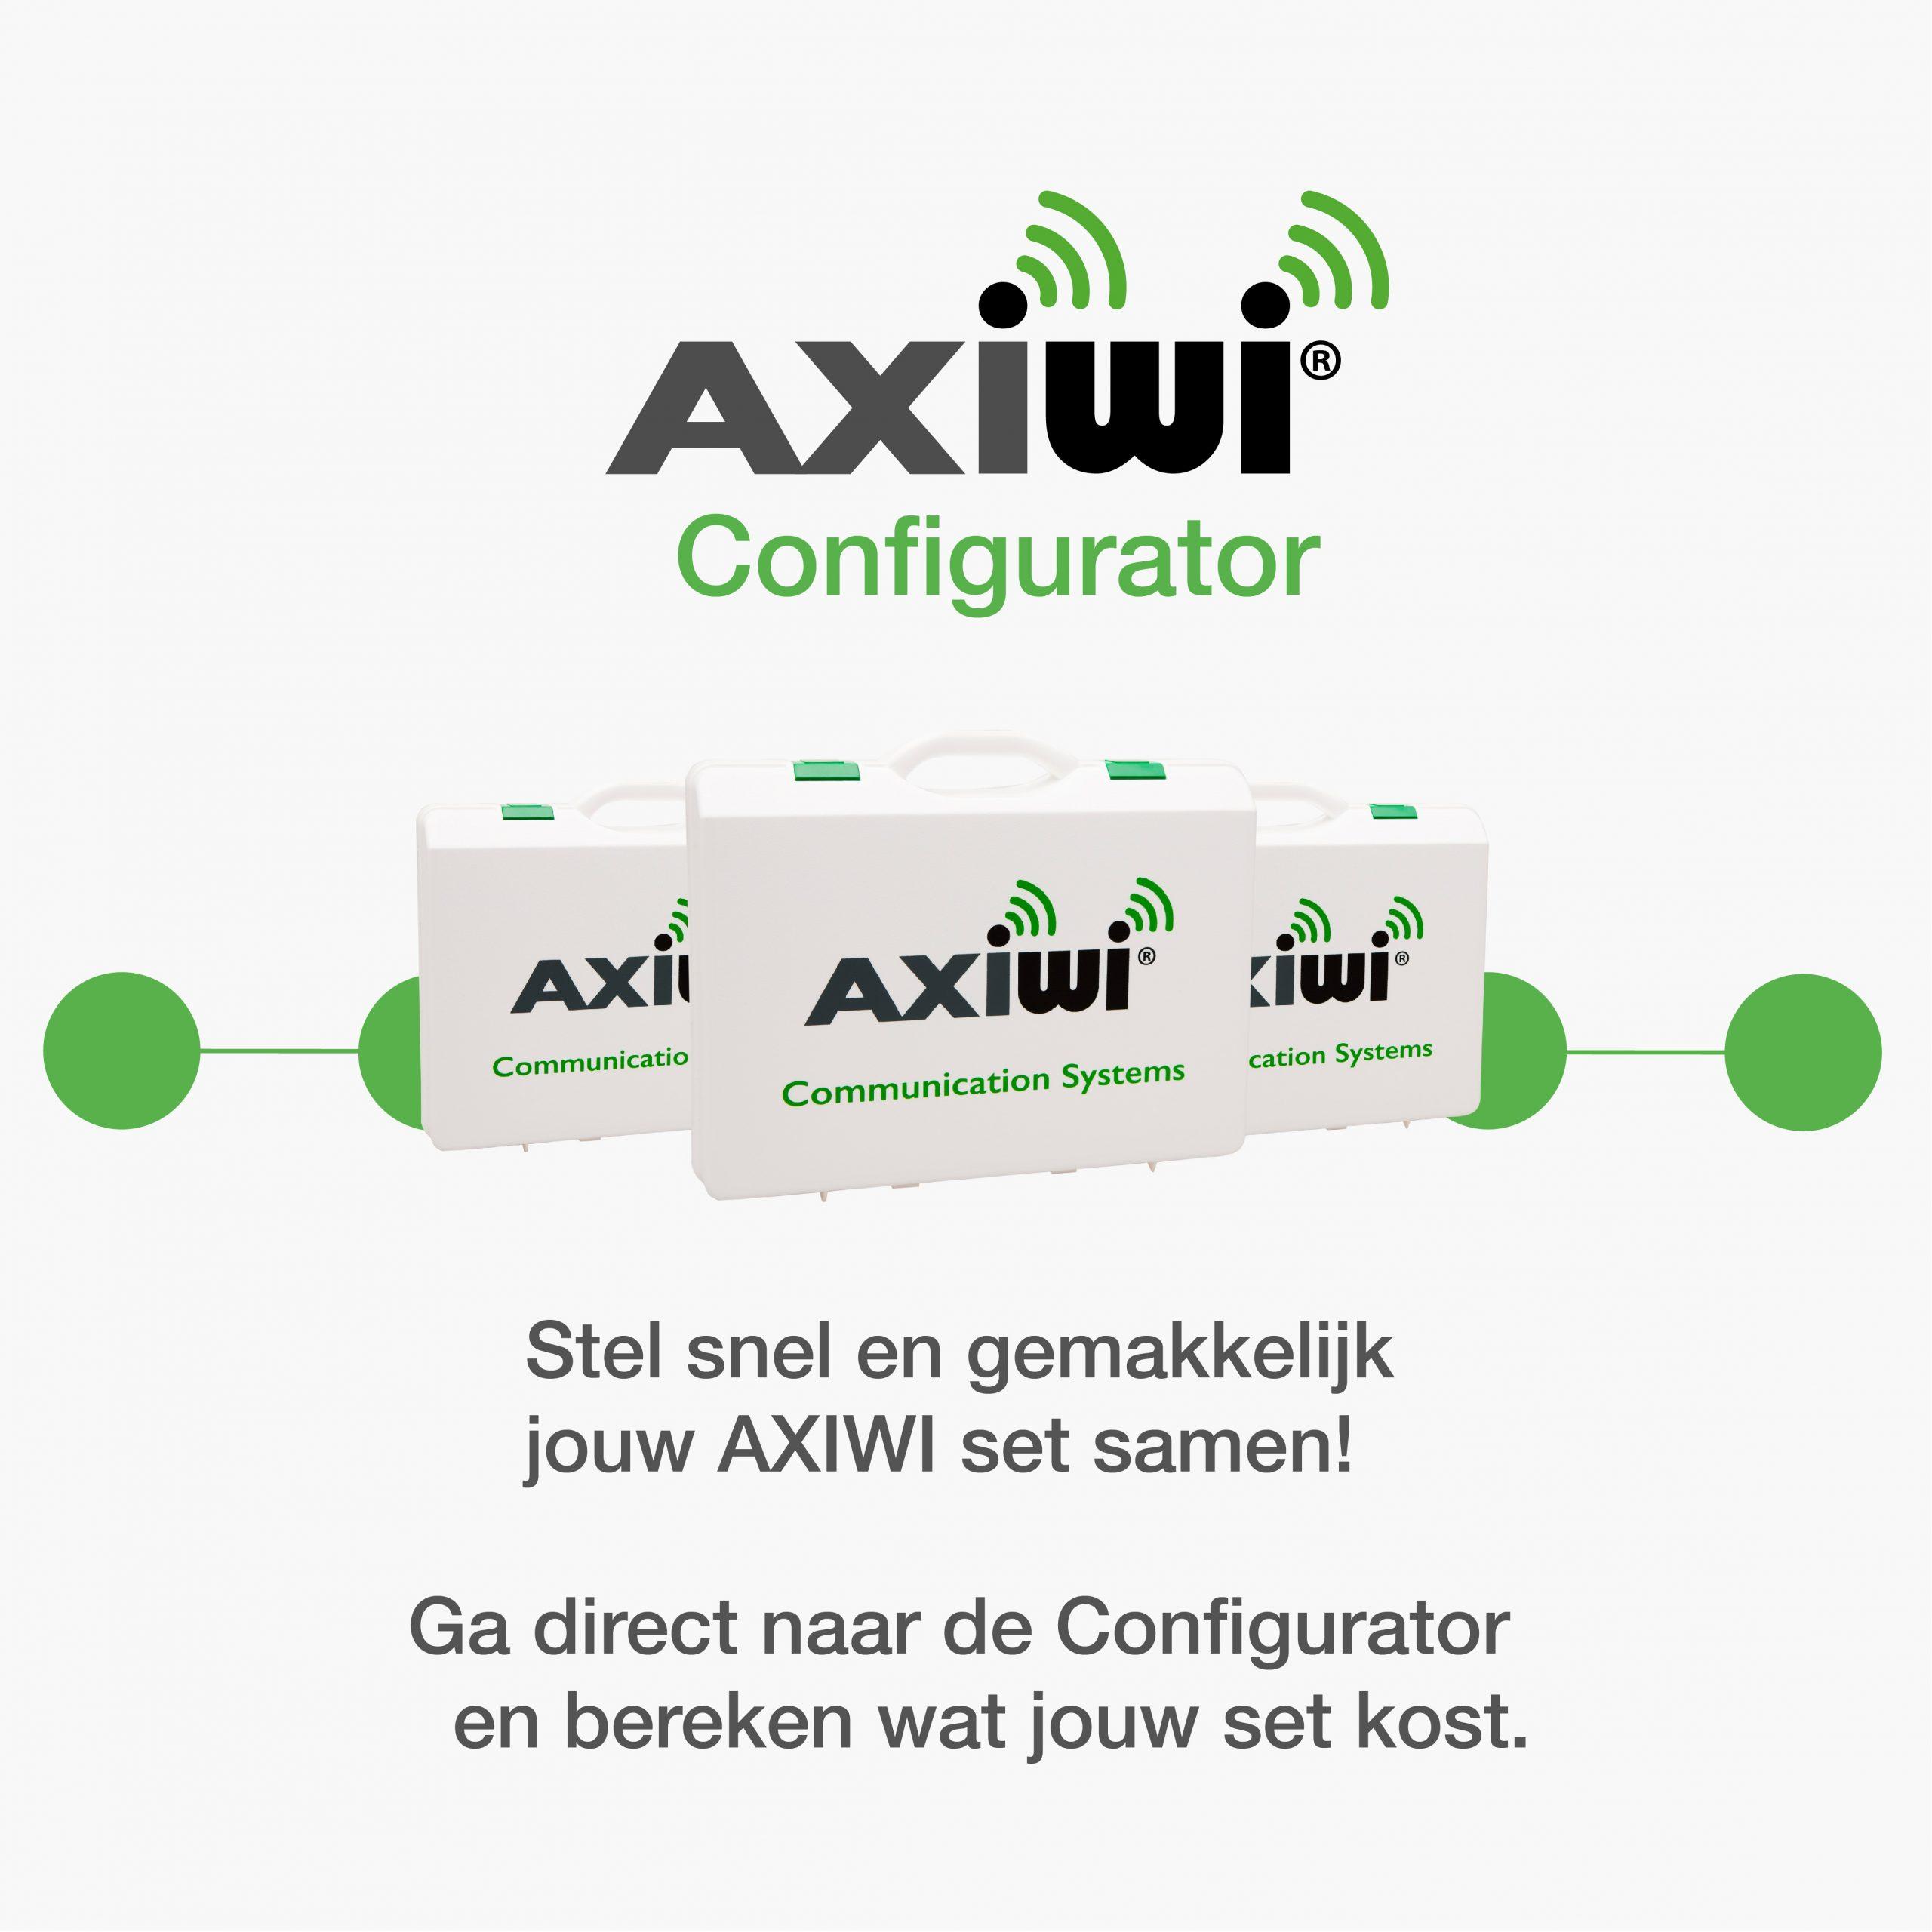 start-axiwi-configurator-website